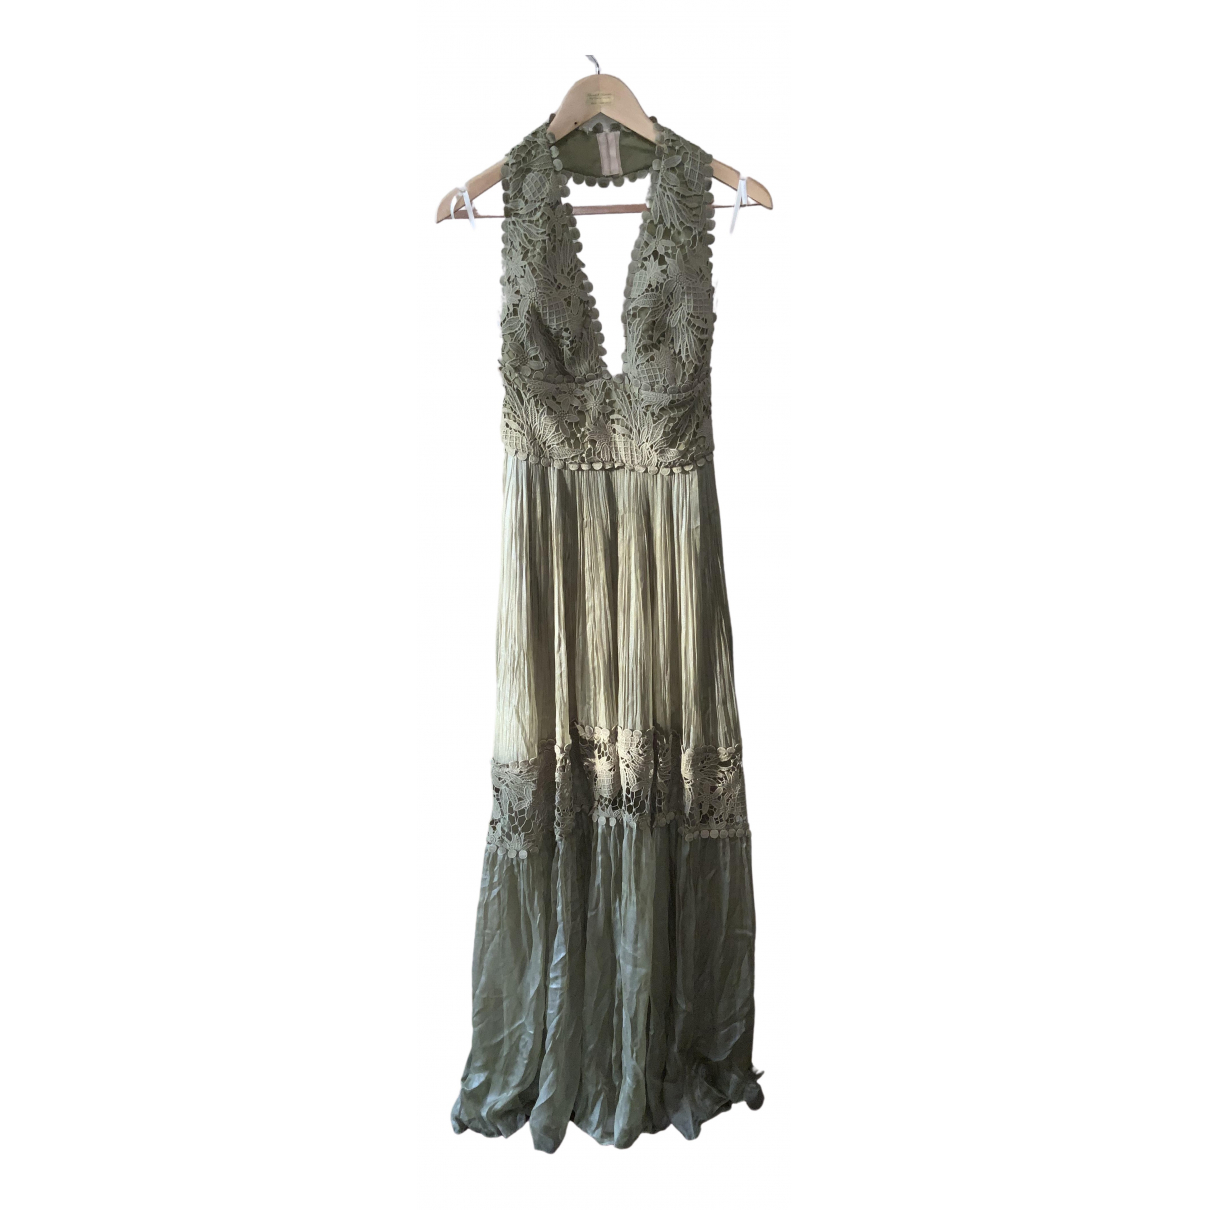 Maria Lucia Hohan N Green Cotton dress for Women 8 UK